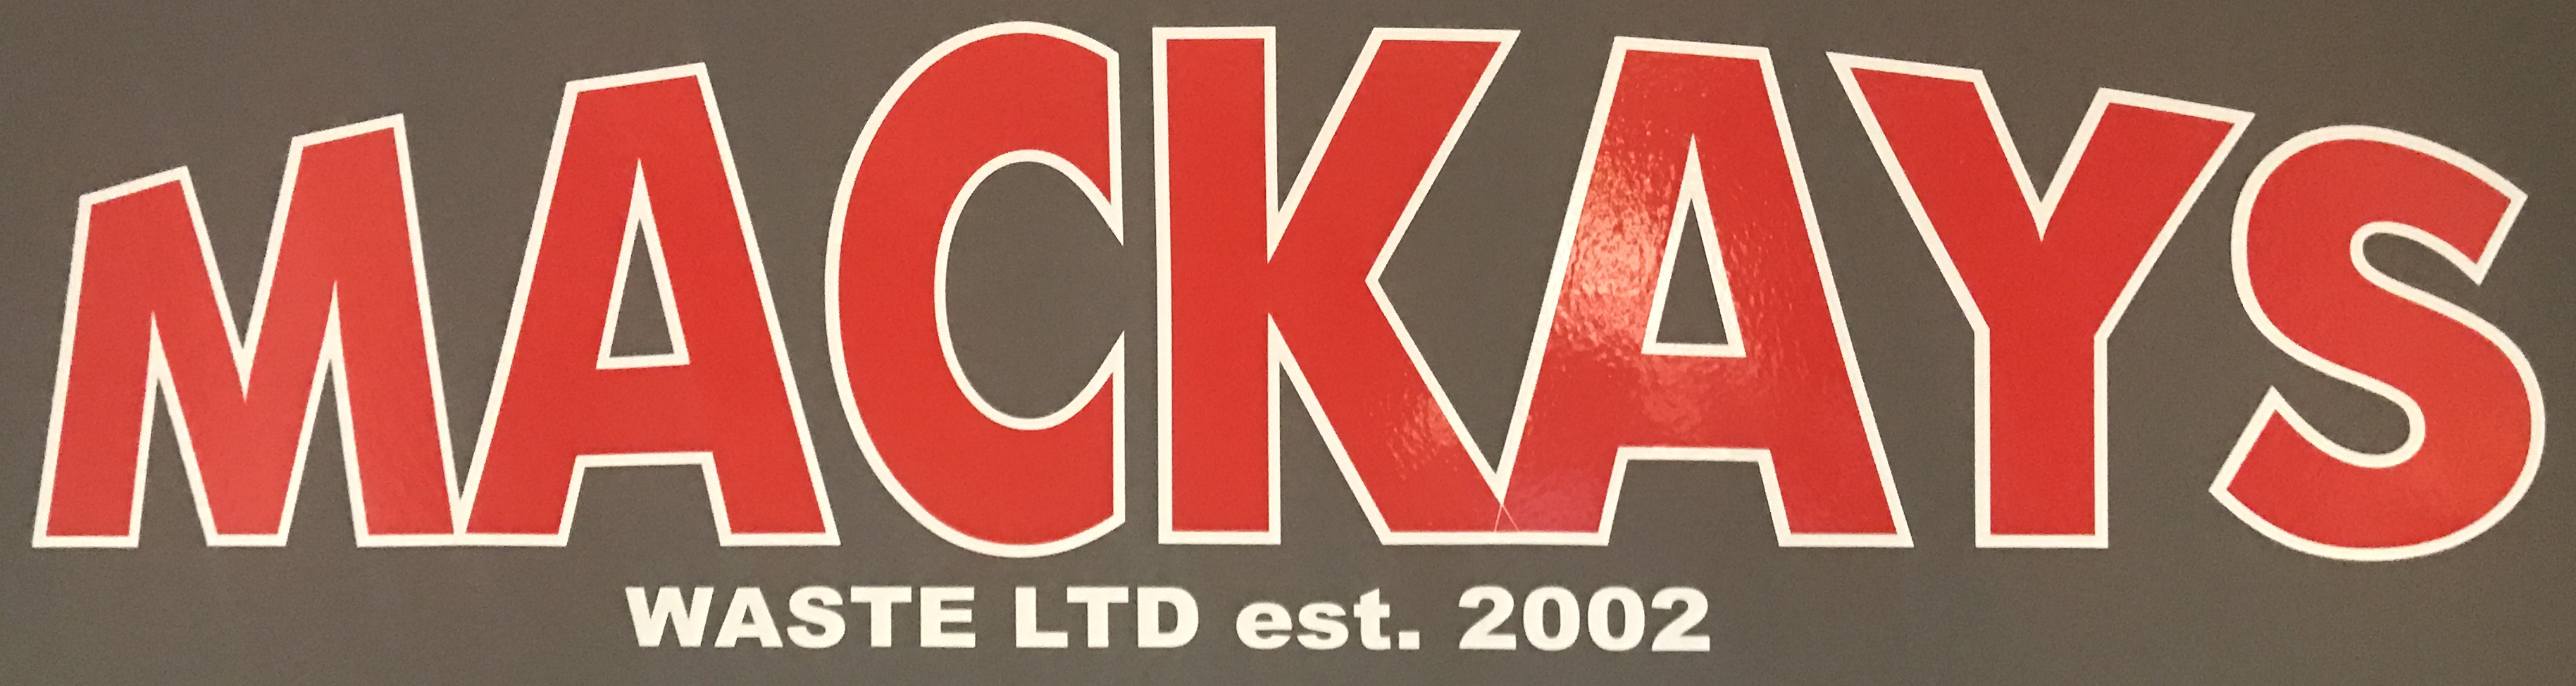 Mackays Waste Ltd Logo